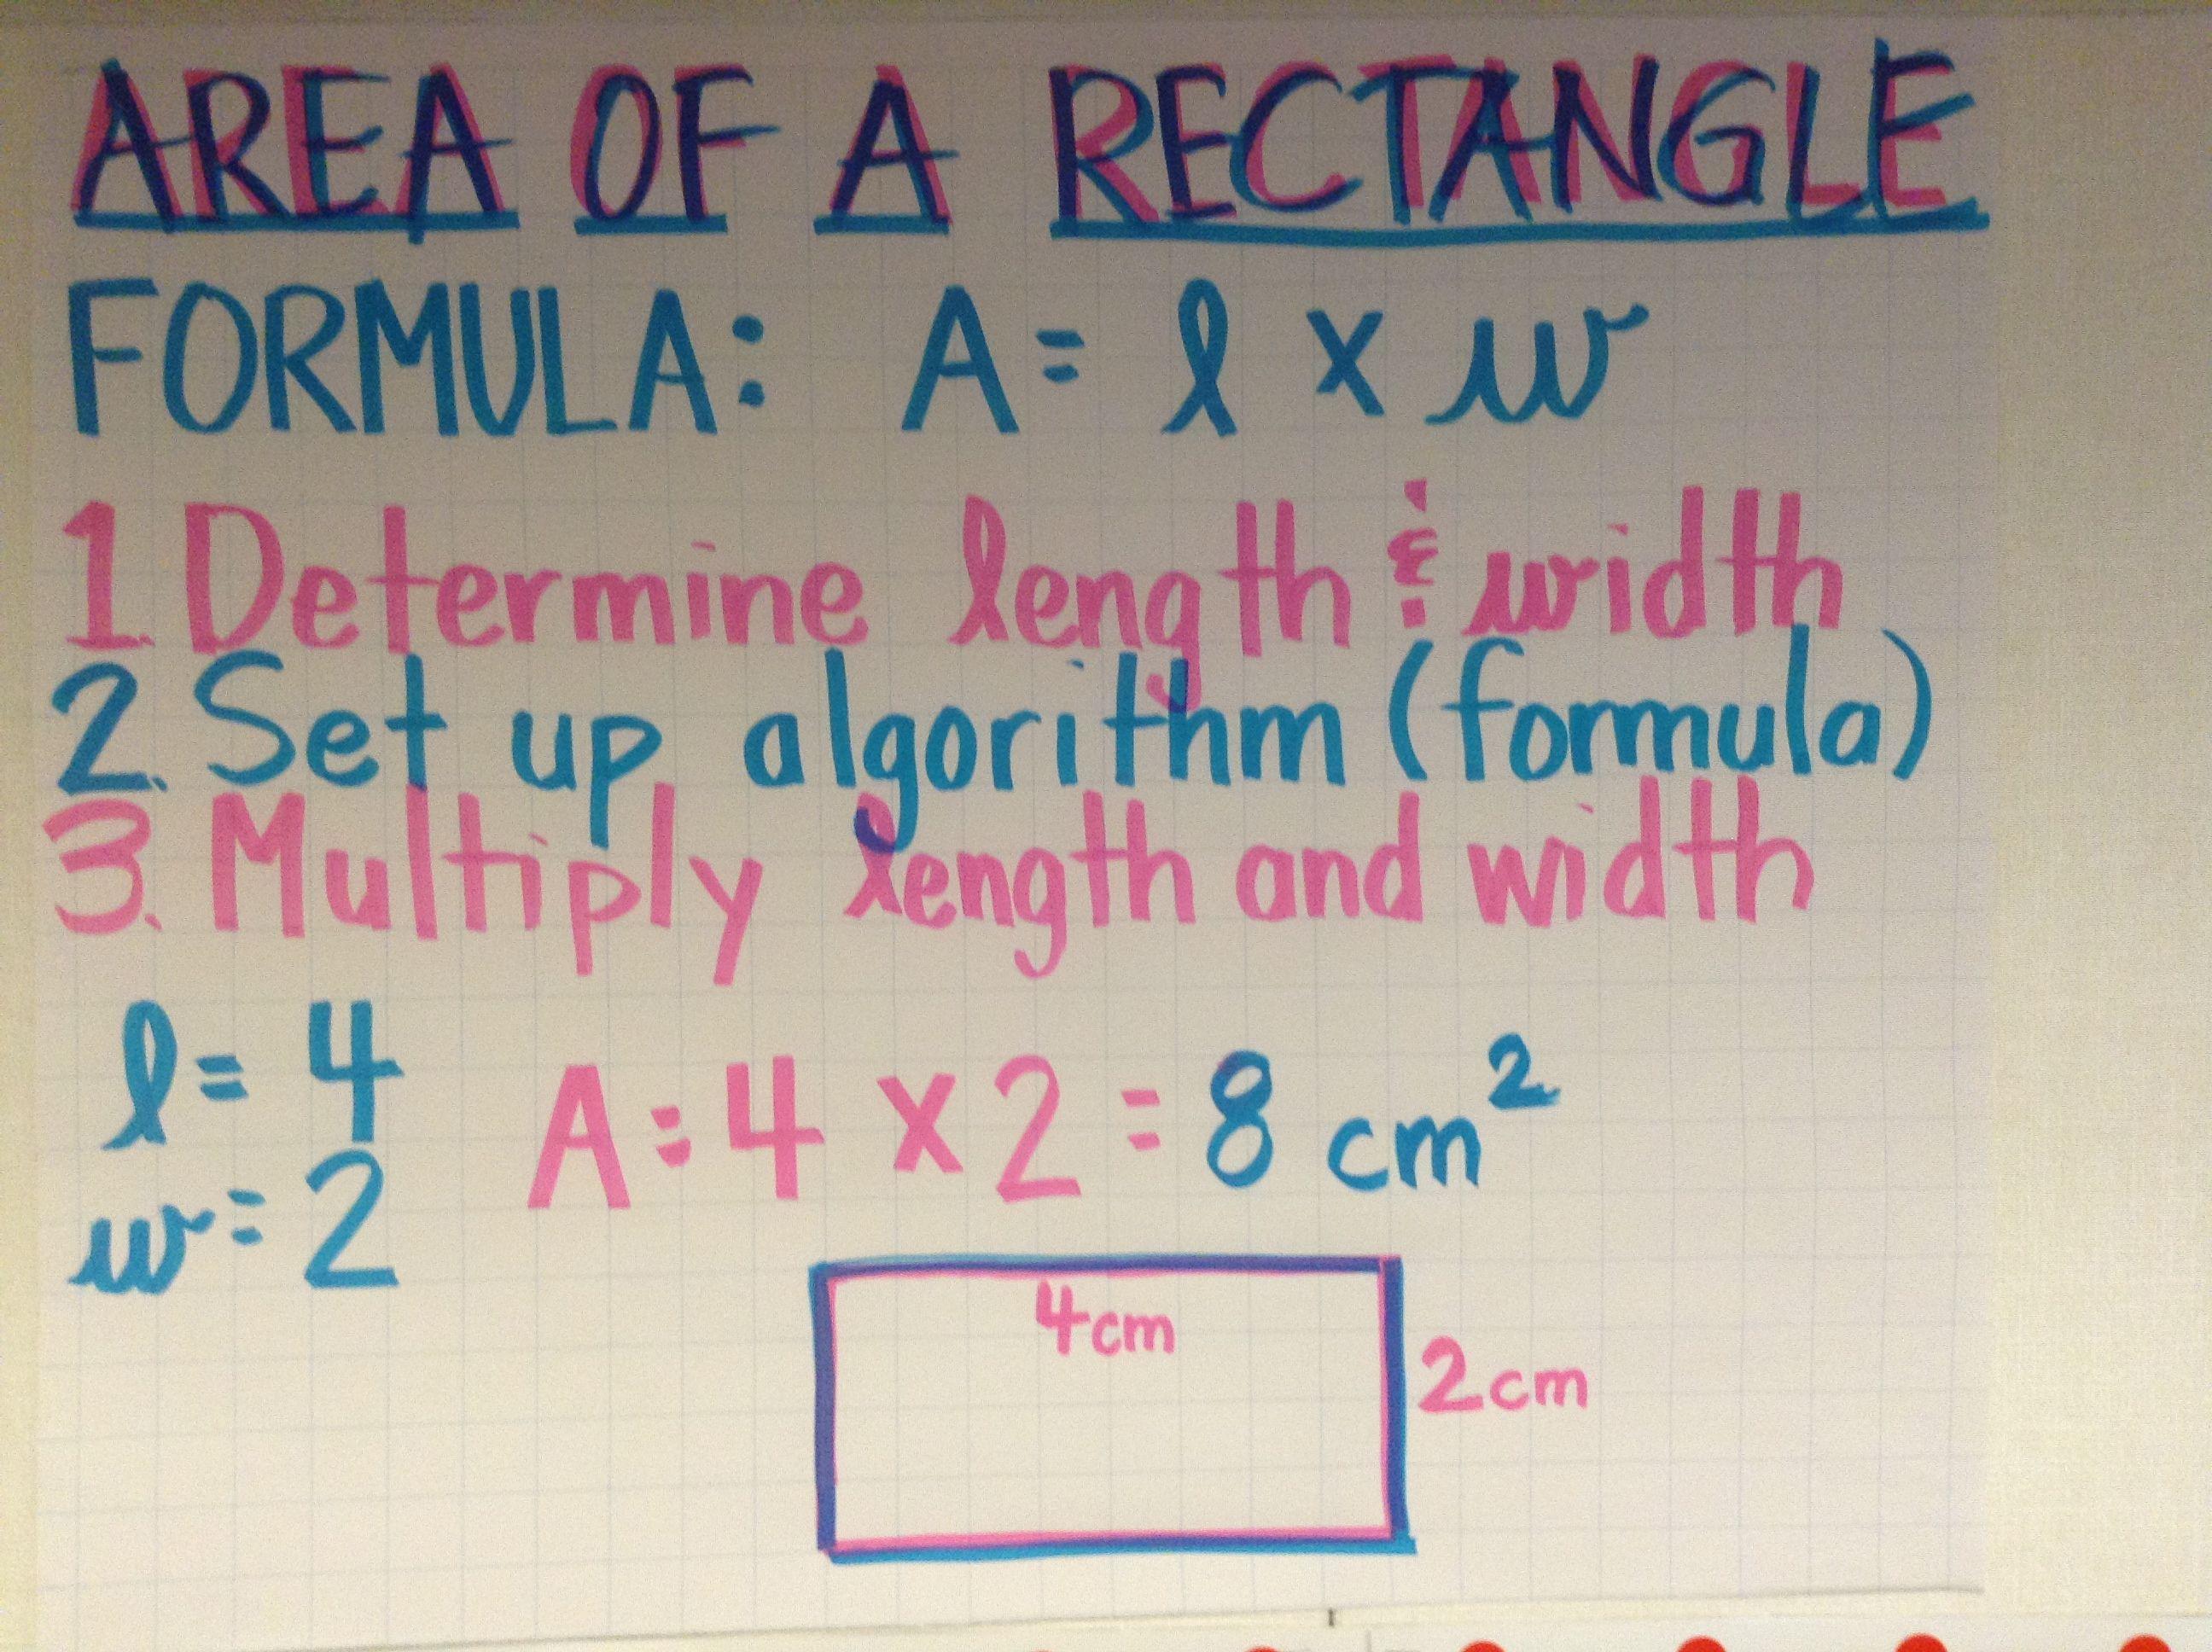 1) 36c 2) 3rd Grade 3) Determine 4) Area Of Rectangles